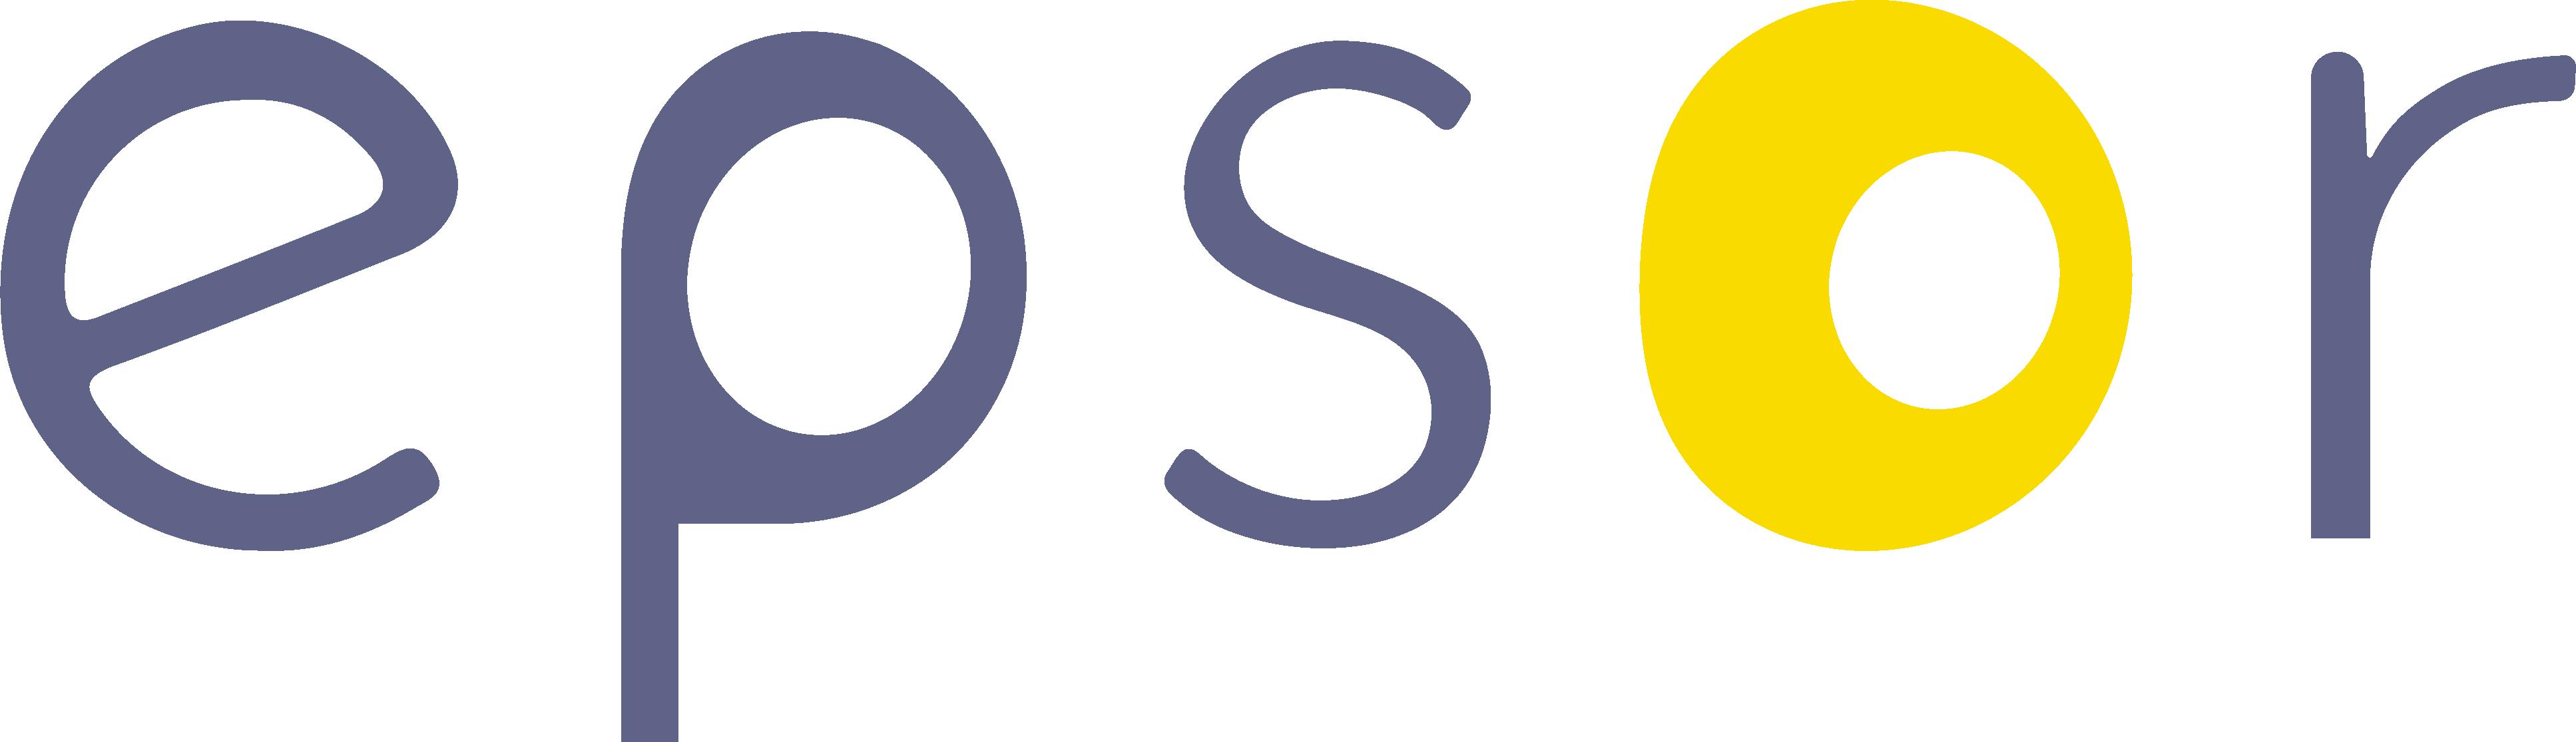 logo epsor fond blanc